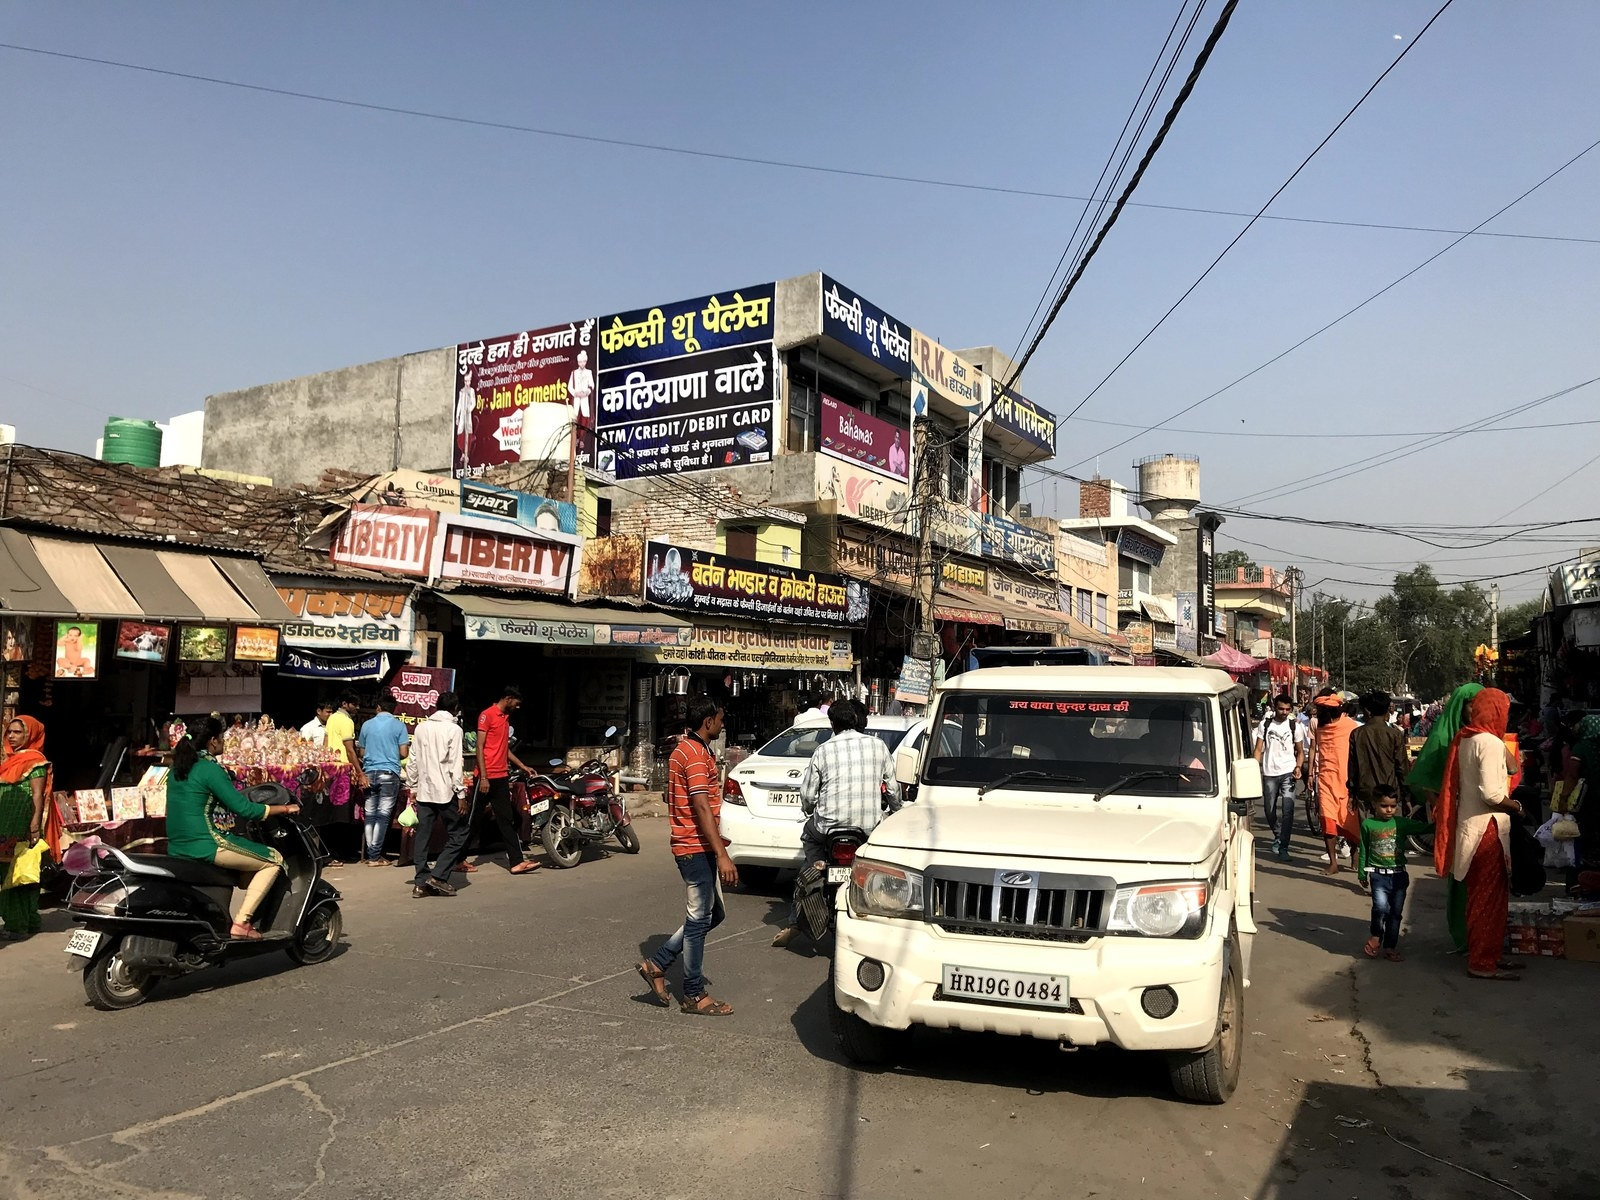 The town of Charkhi Dadri, Haryana, India